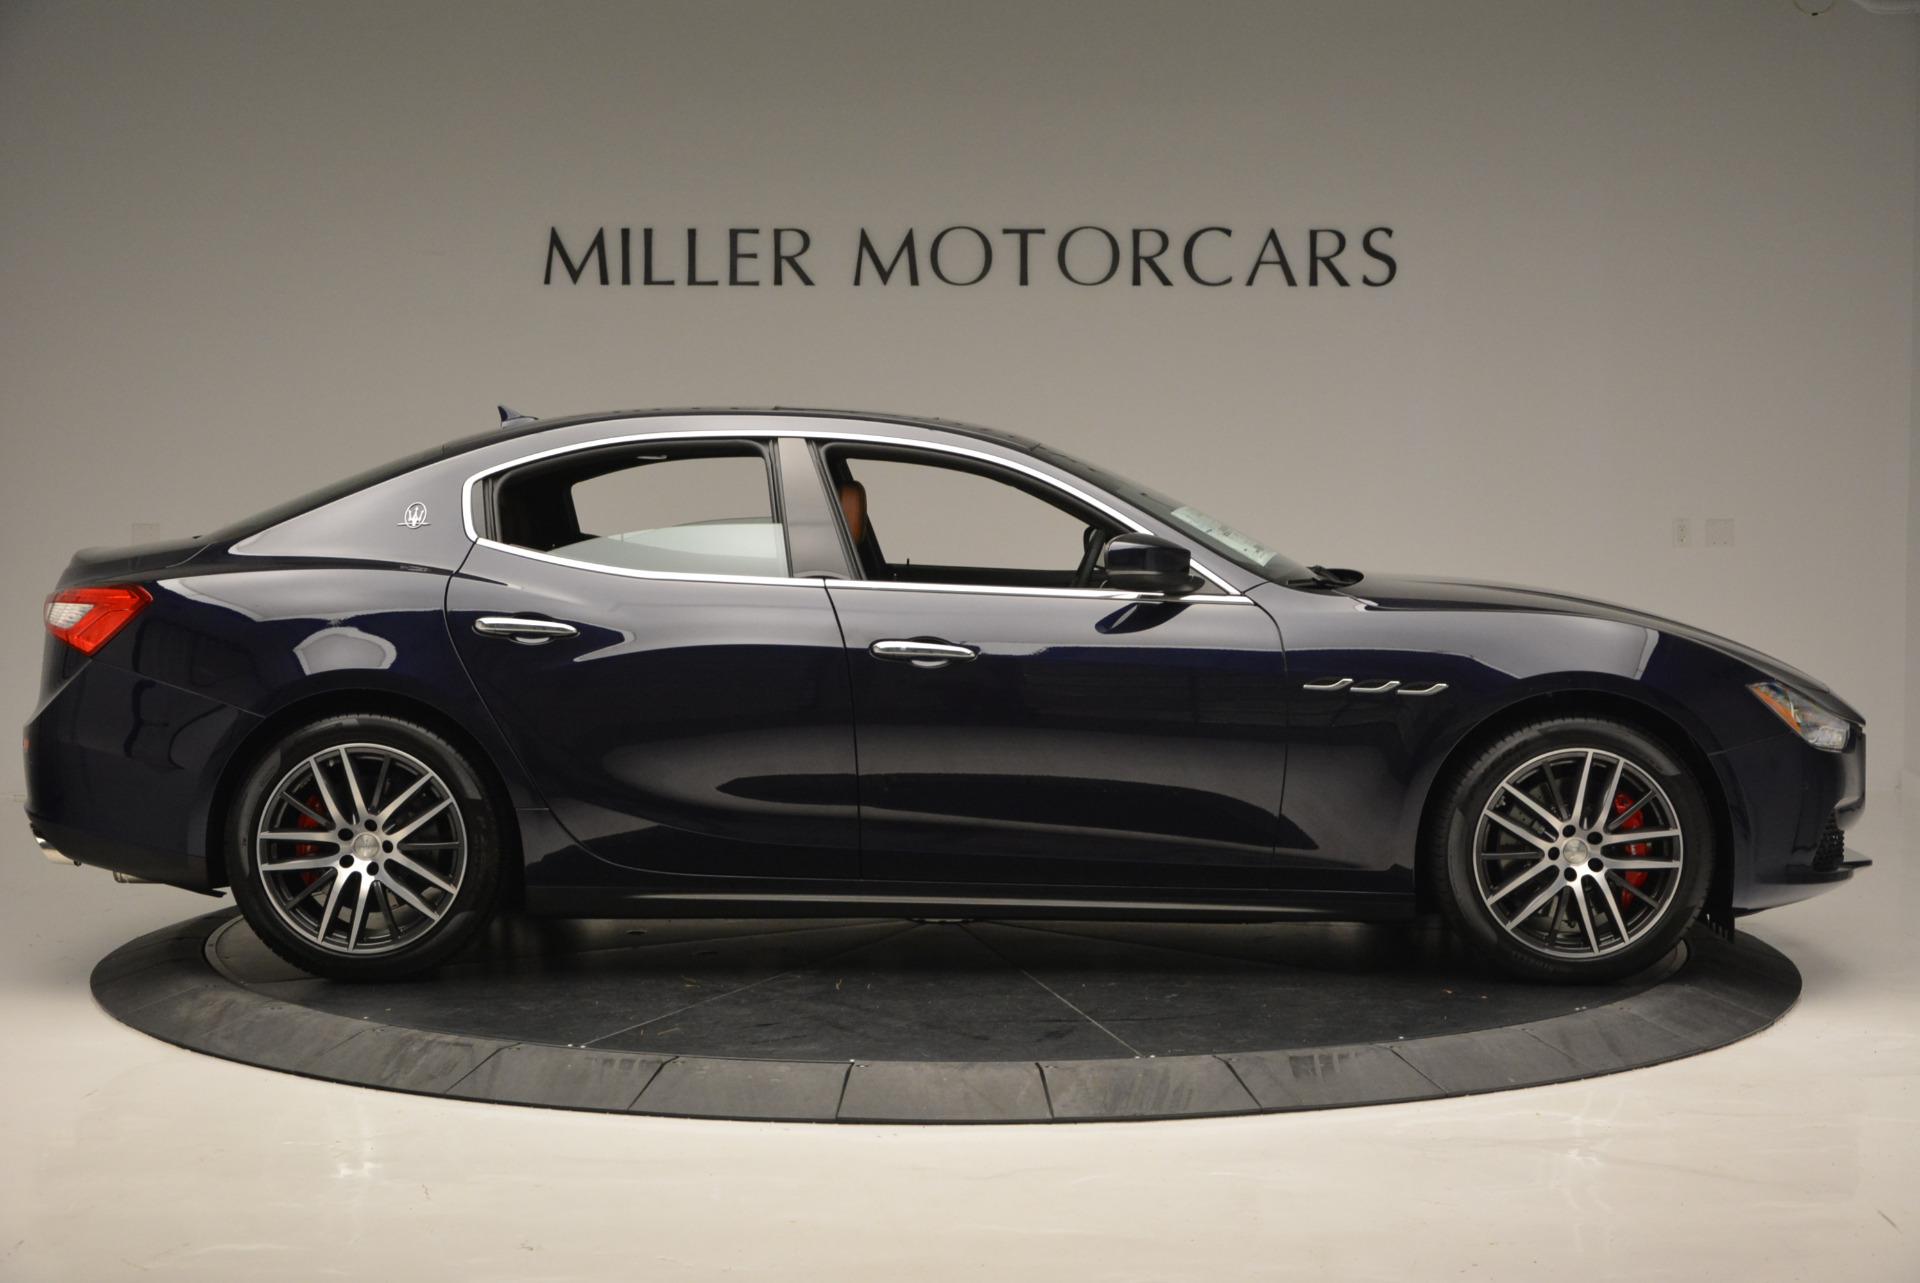 Used 2017 Maserati Ghibli S Q4 - EX Loaner For Sale In Greenwich, CT 567_p9